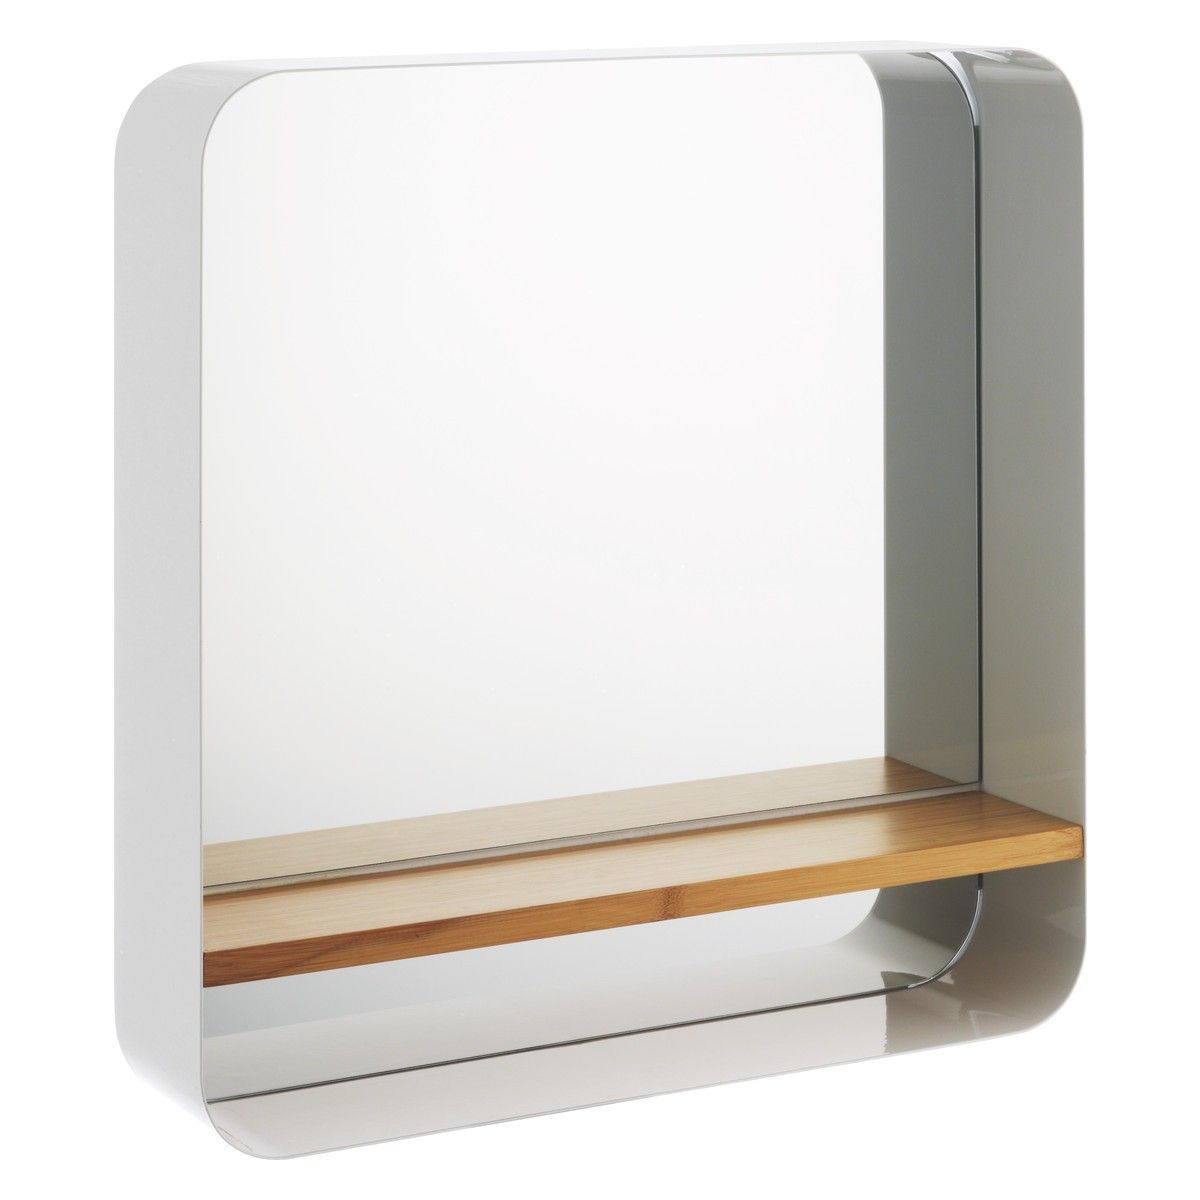 Bathroom mirror with shelf uk - Latest Posts Under Bathroom Wall Mirrors